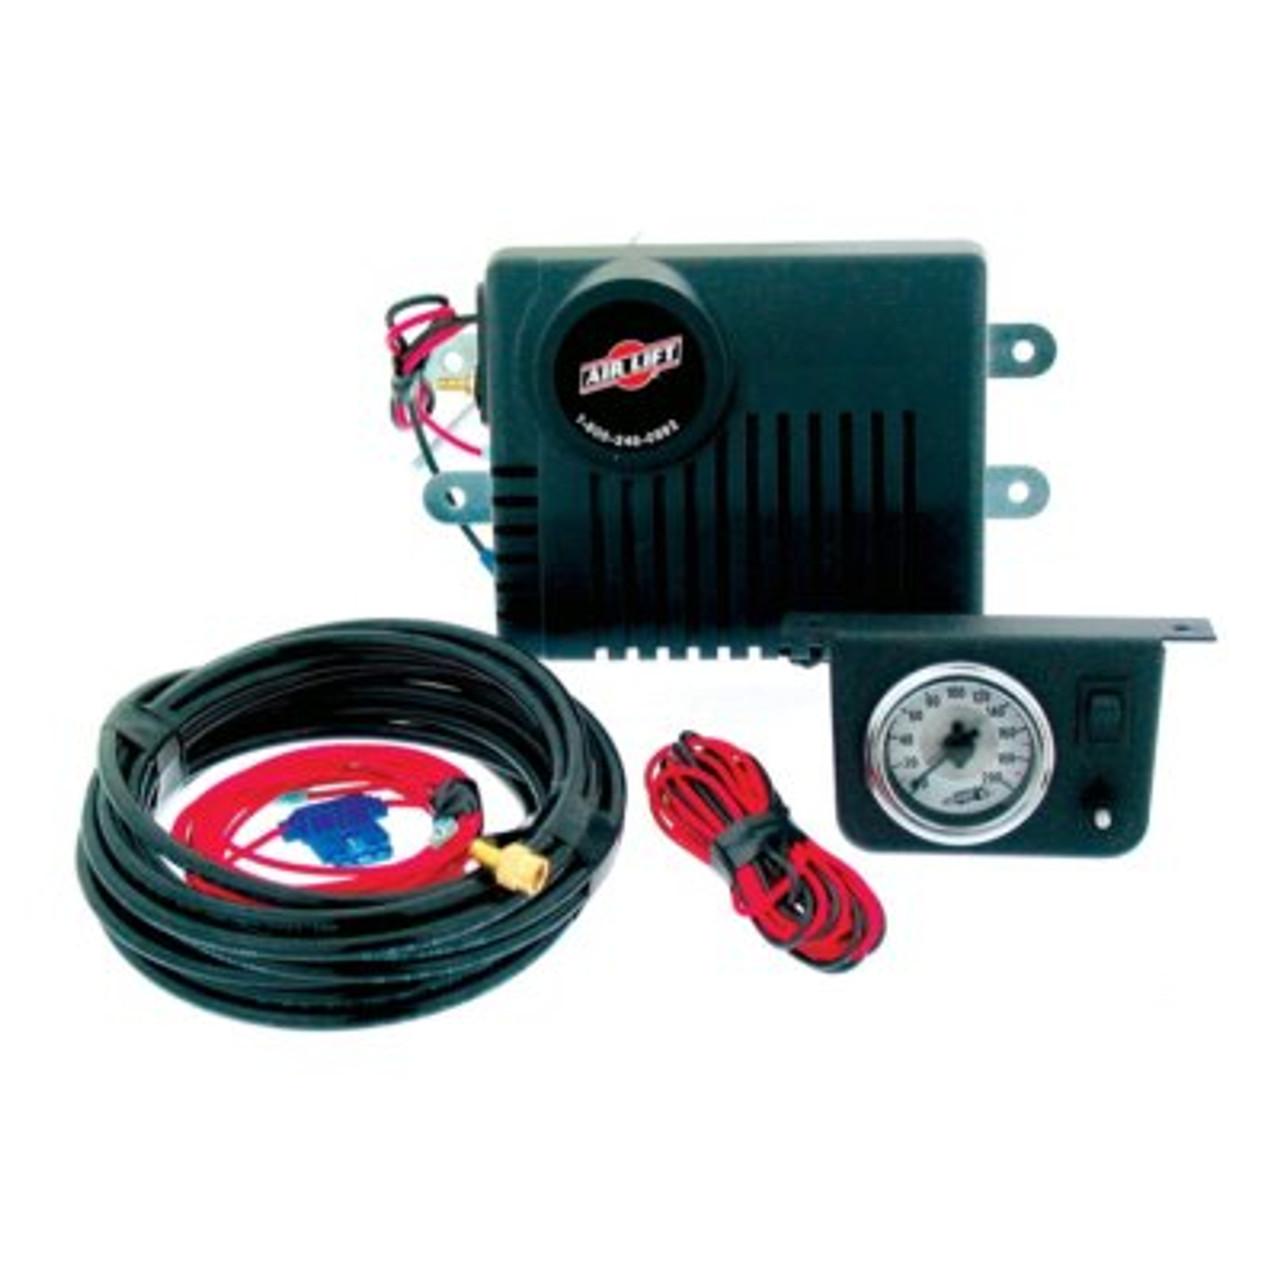 AIR25804, Air Compressor, Suspension, 160 psi Max, 12V, Single Gauge